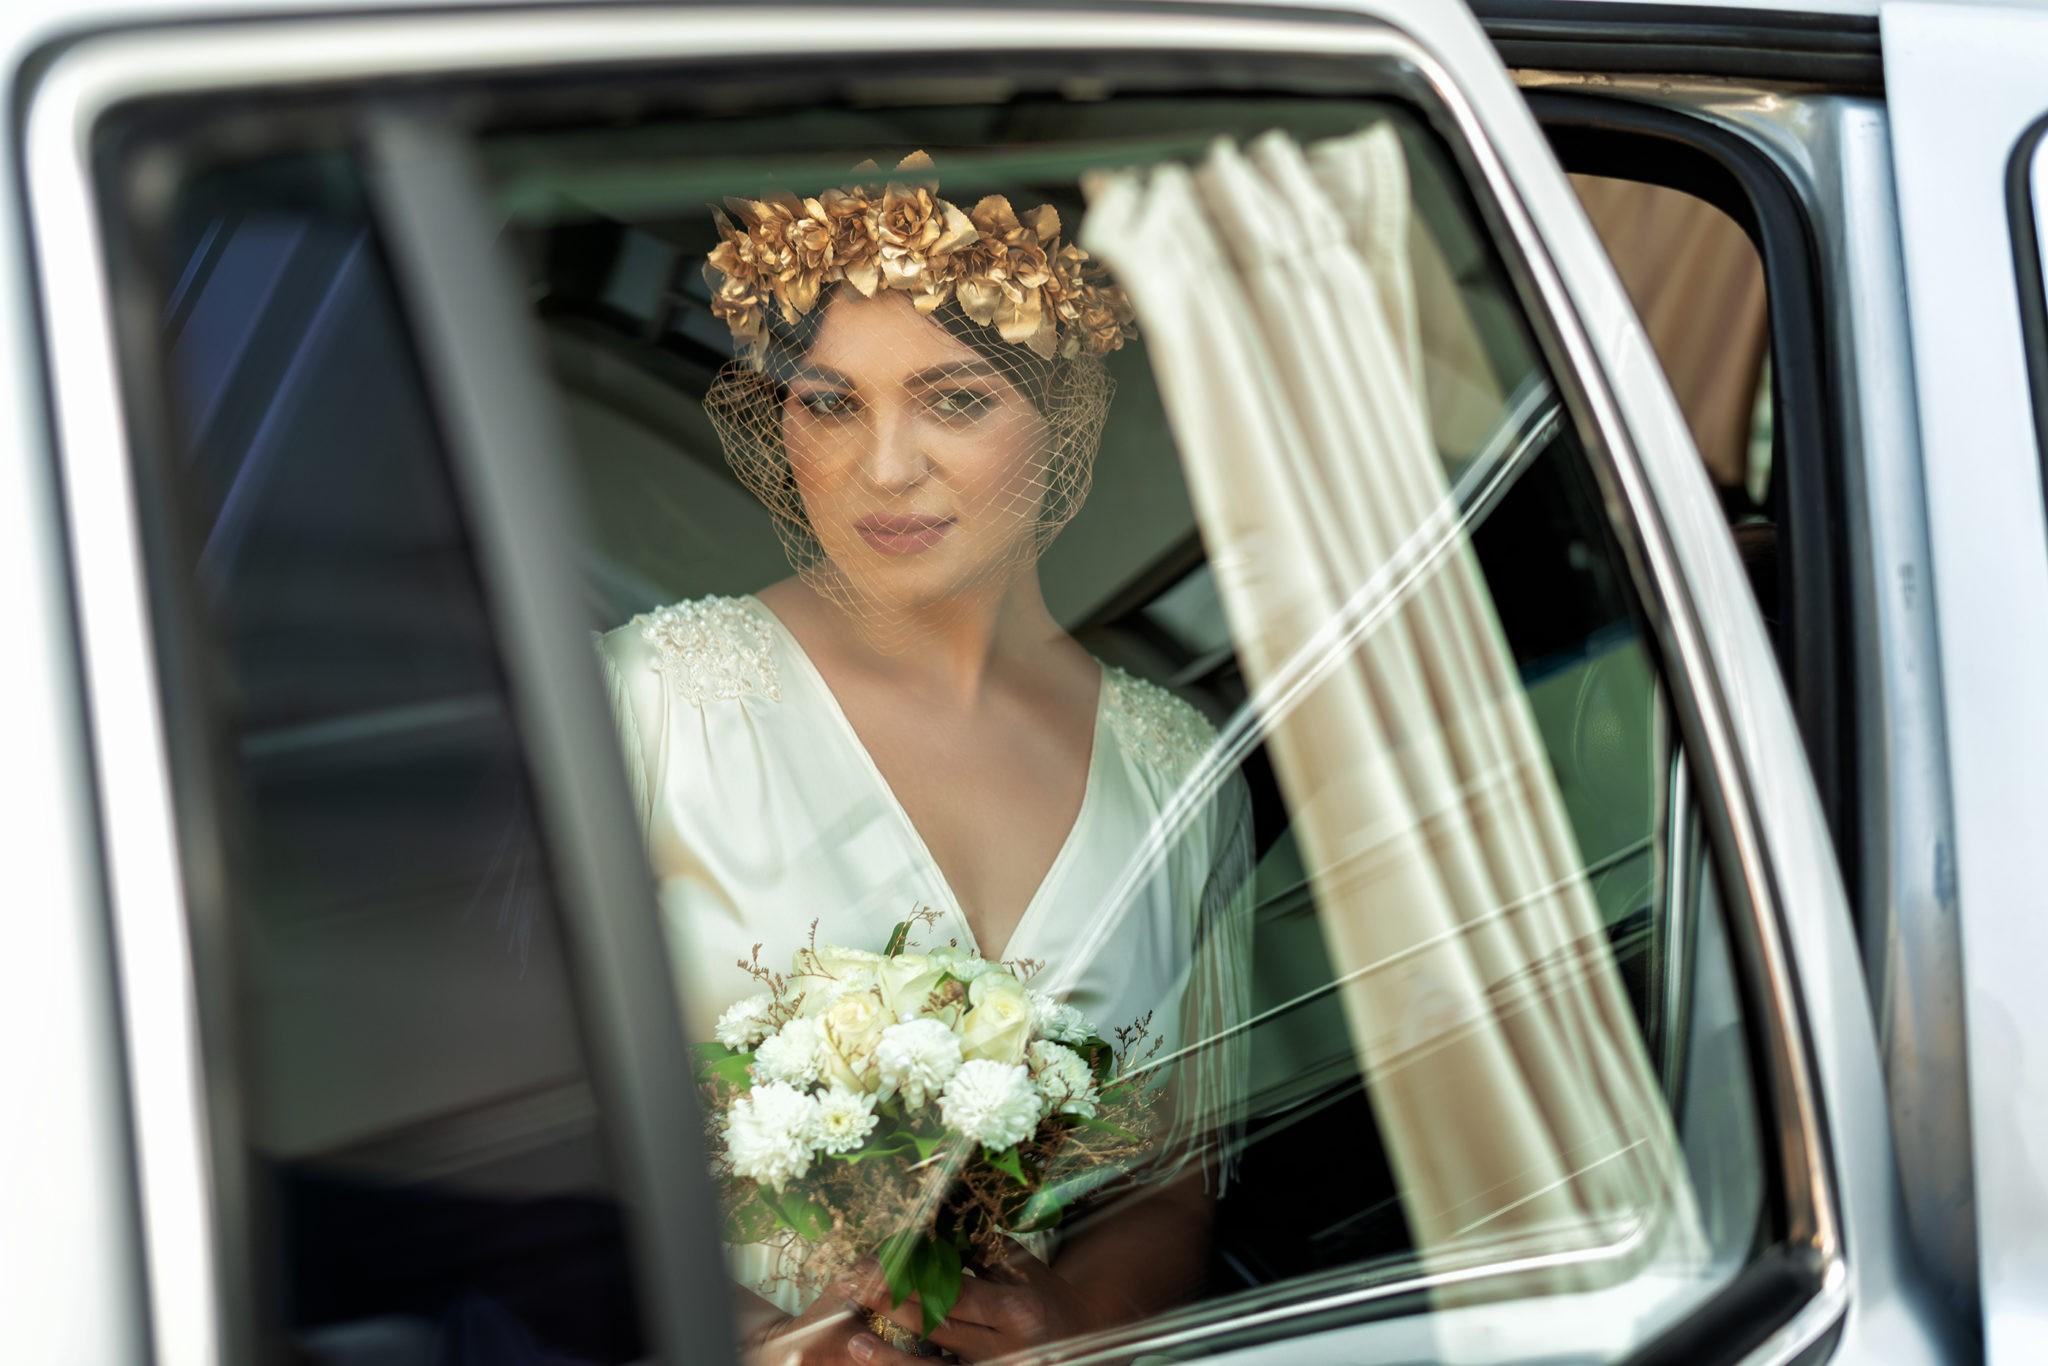 Cвадебная фотосъемка в ЗАГСе Екатерининский Зал Краснодар от свадебного фотографа: подъезд к ЗАГСу